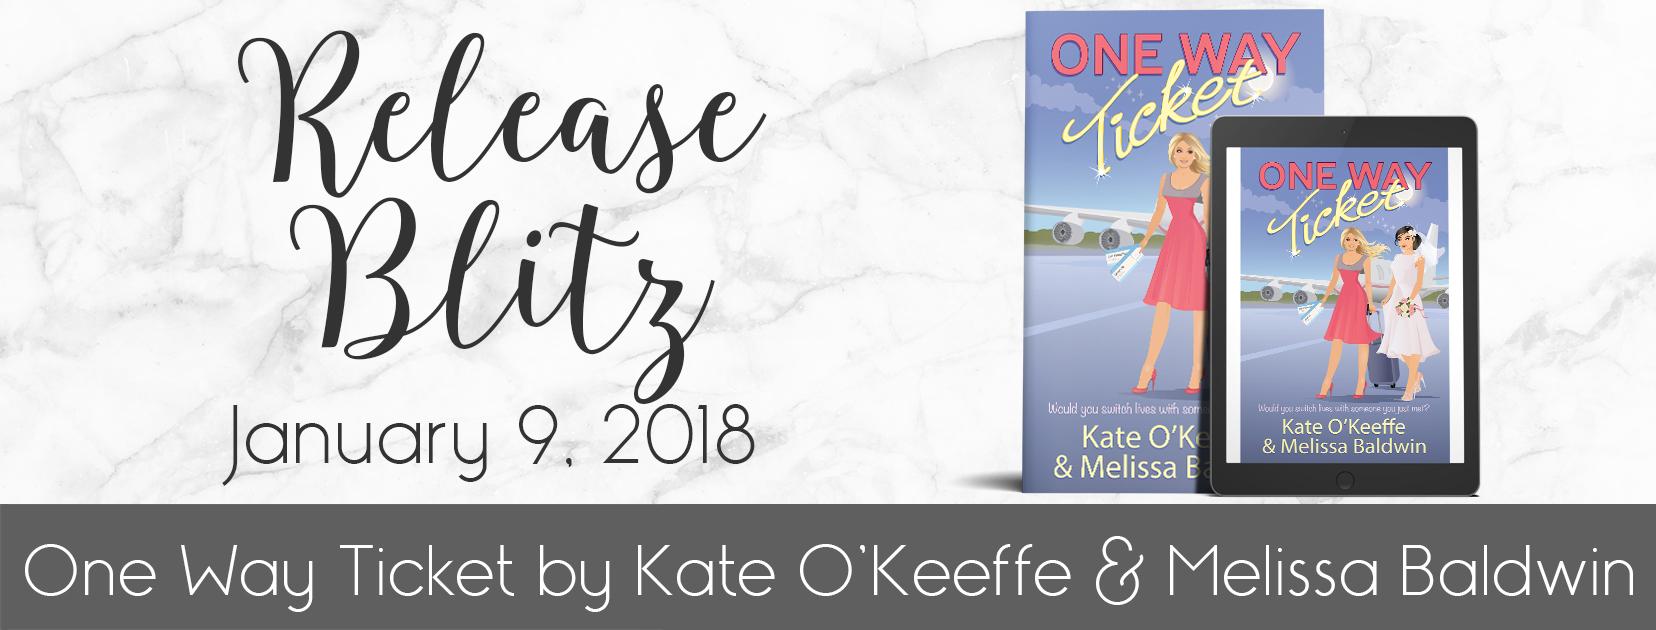 New Release | Kate O'Keeffe + Melissa Baldwin - One Way Ticket